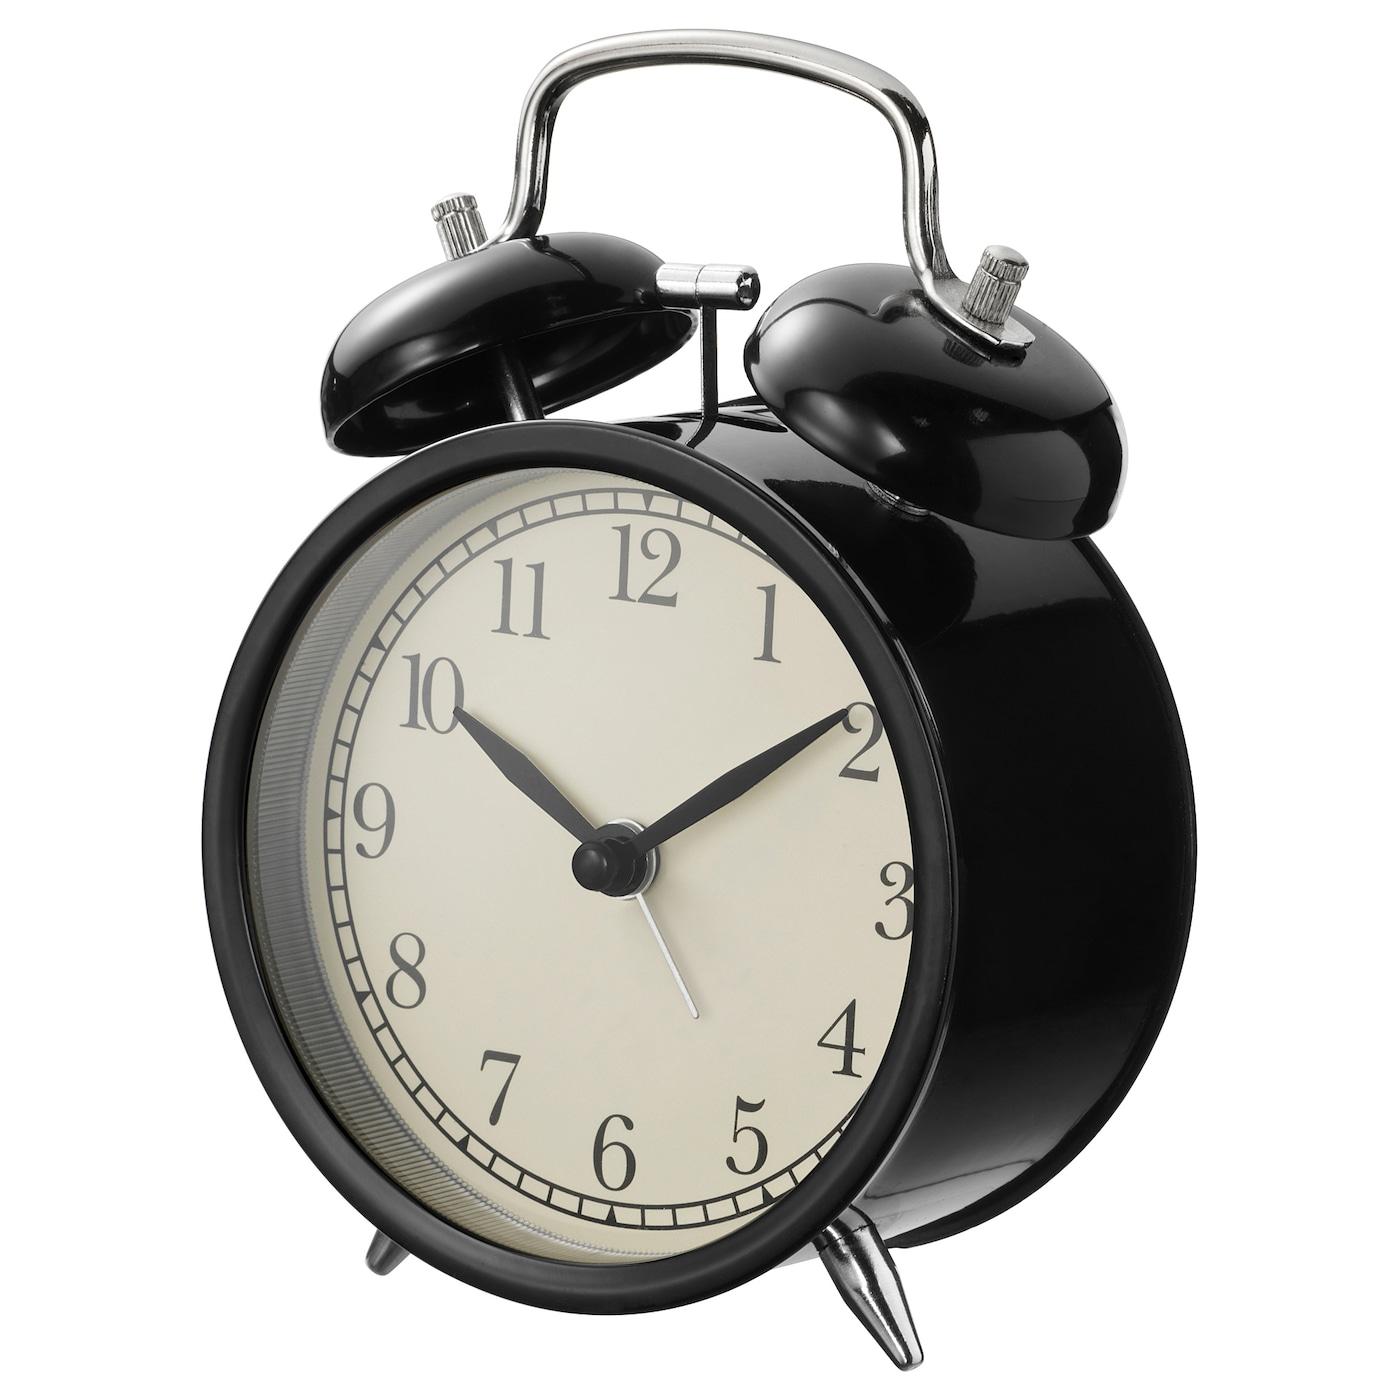 DEKAD Alarm clock, black - IKEA